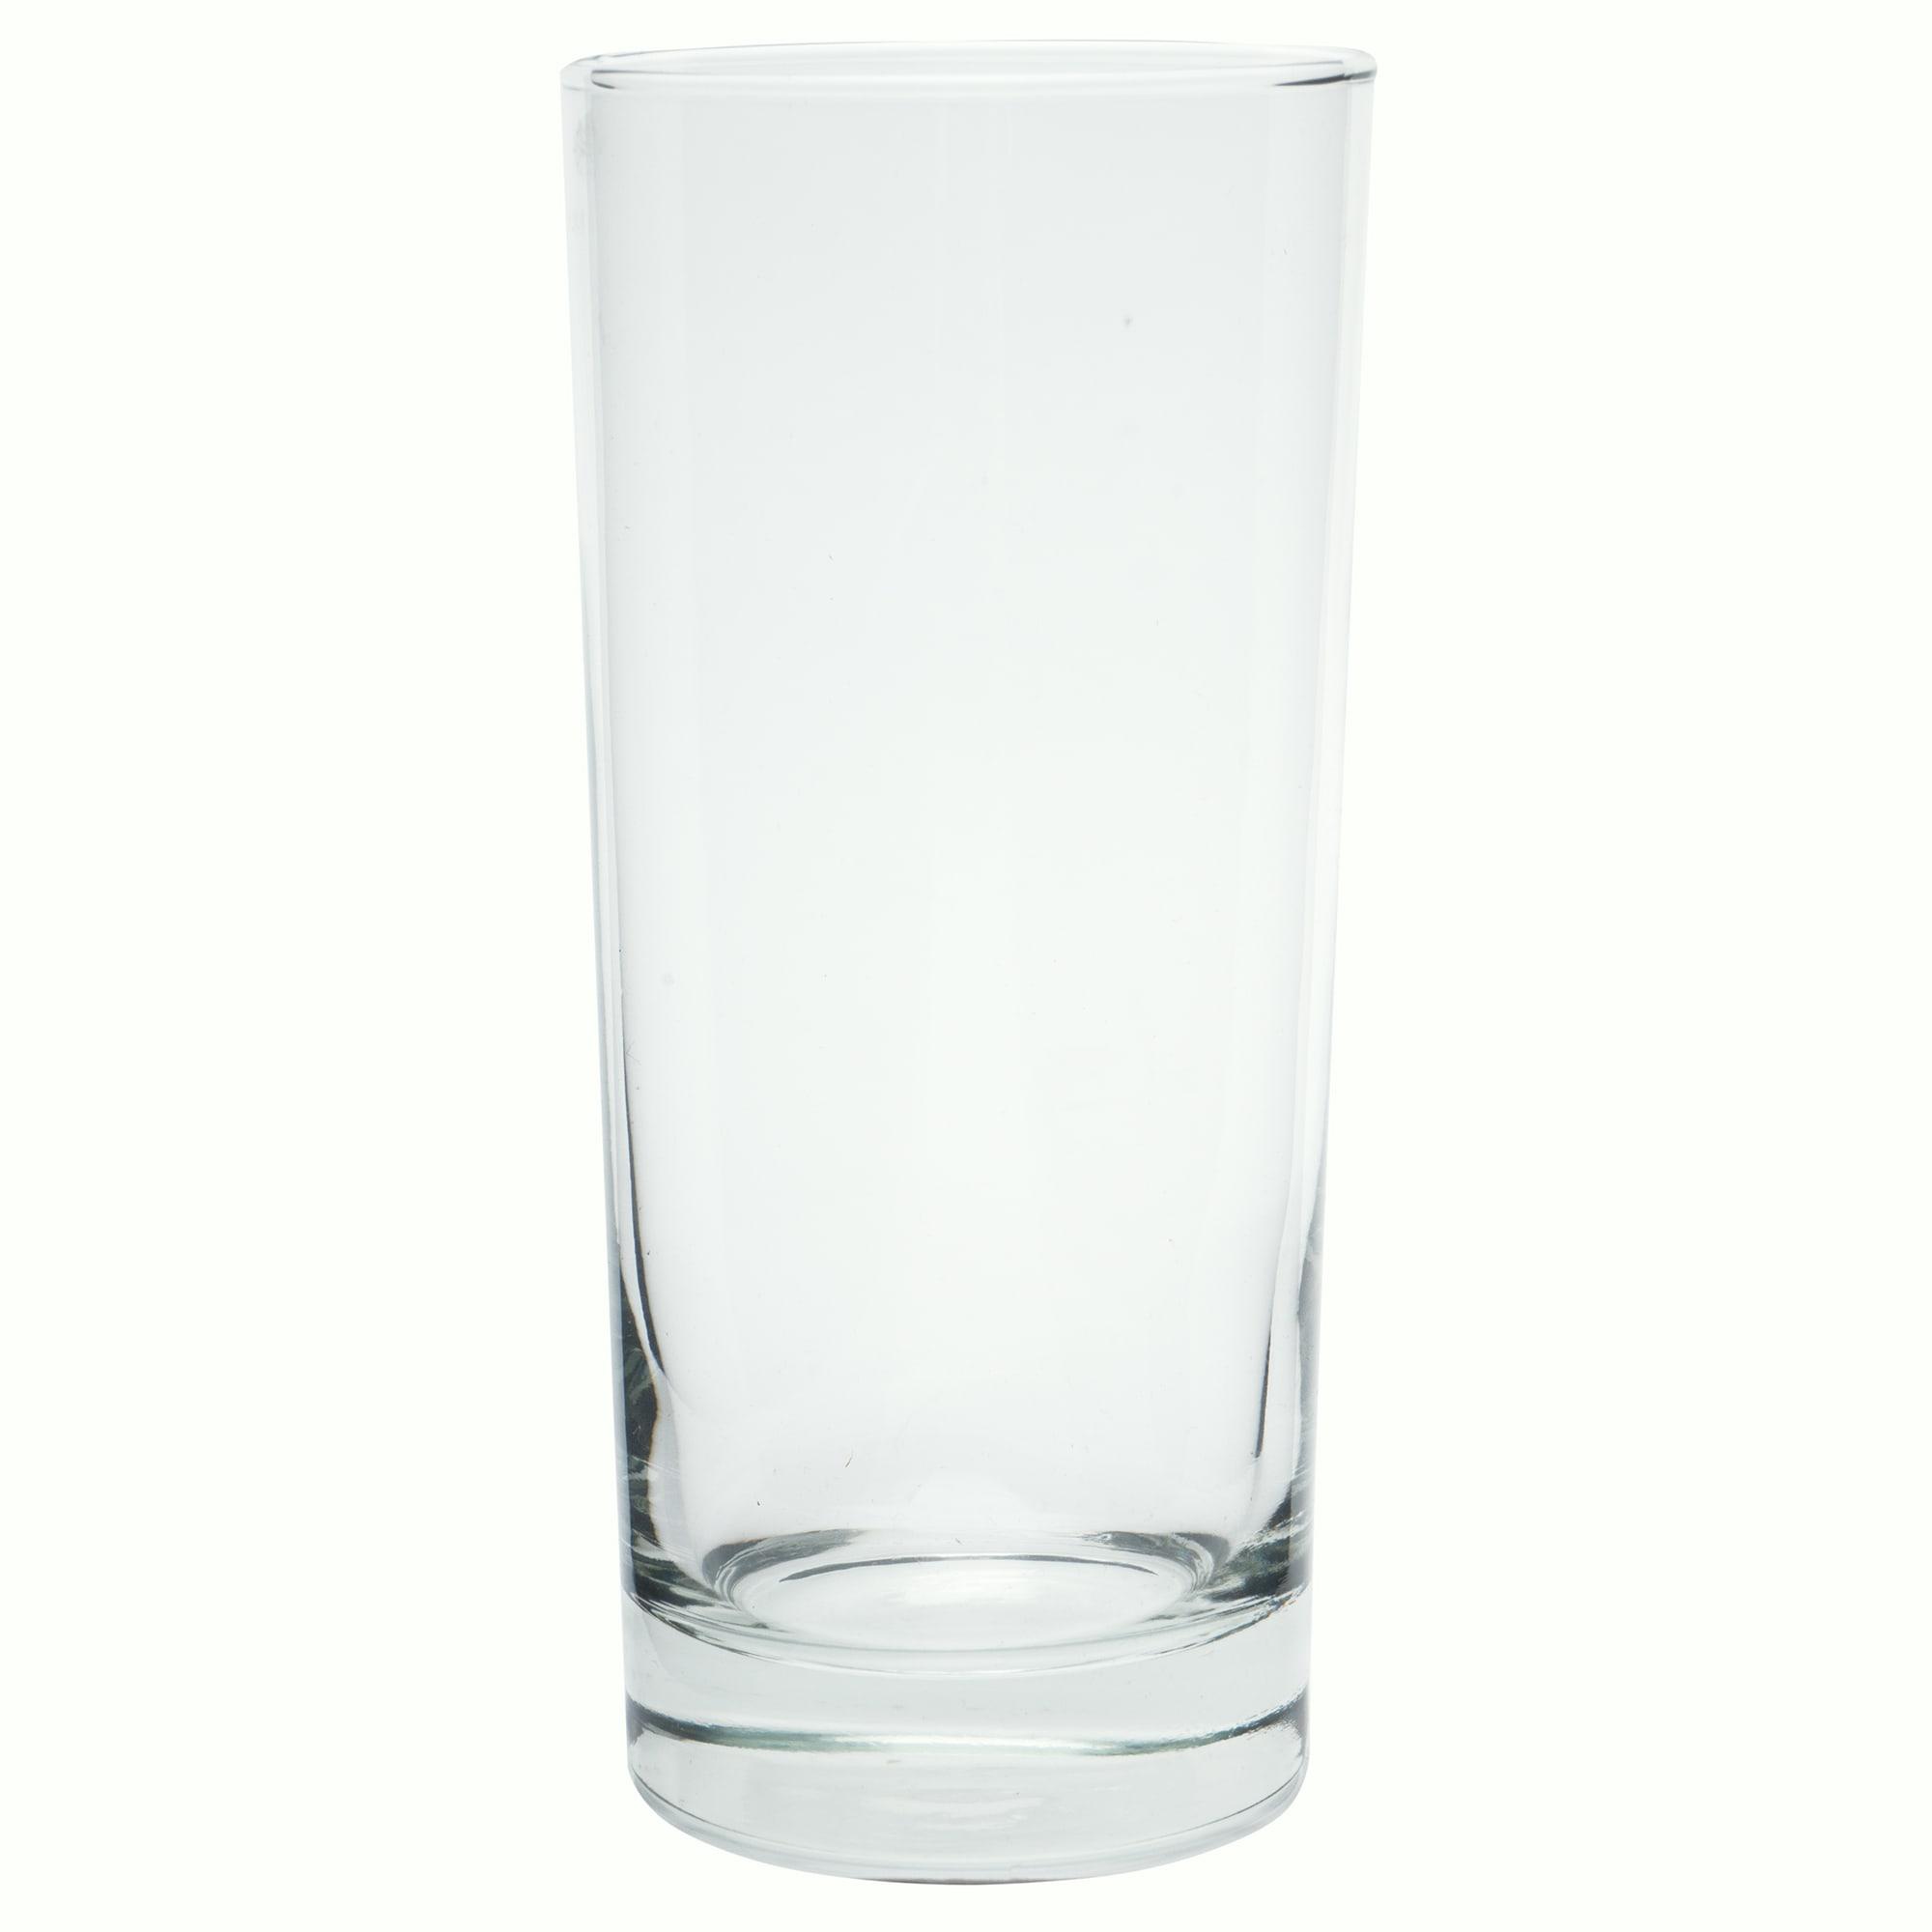 Libbey 817CD 15.25-oz Heavy Base Cooler Glass - Finedge